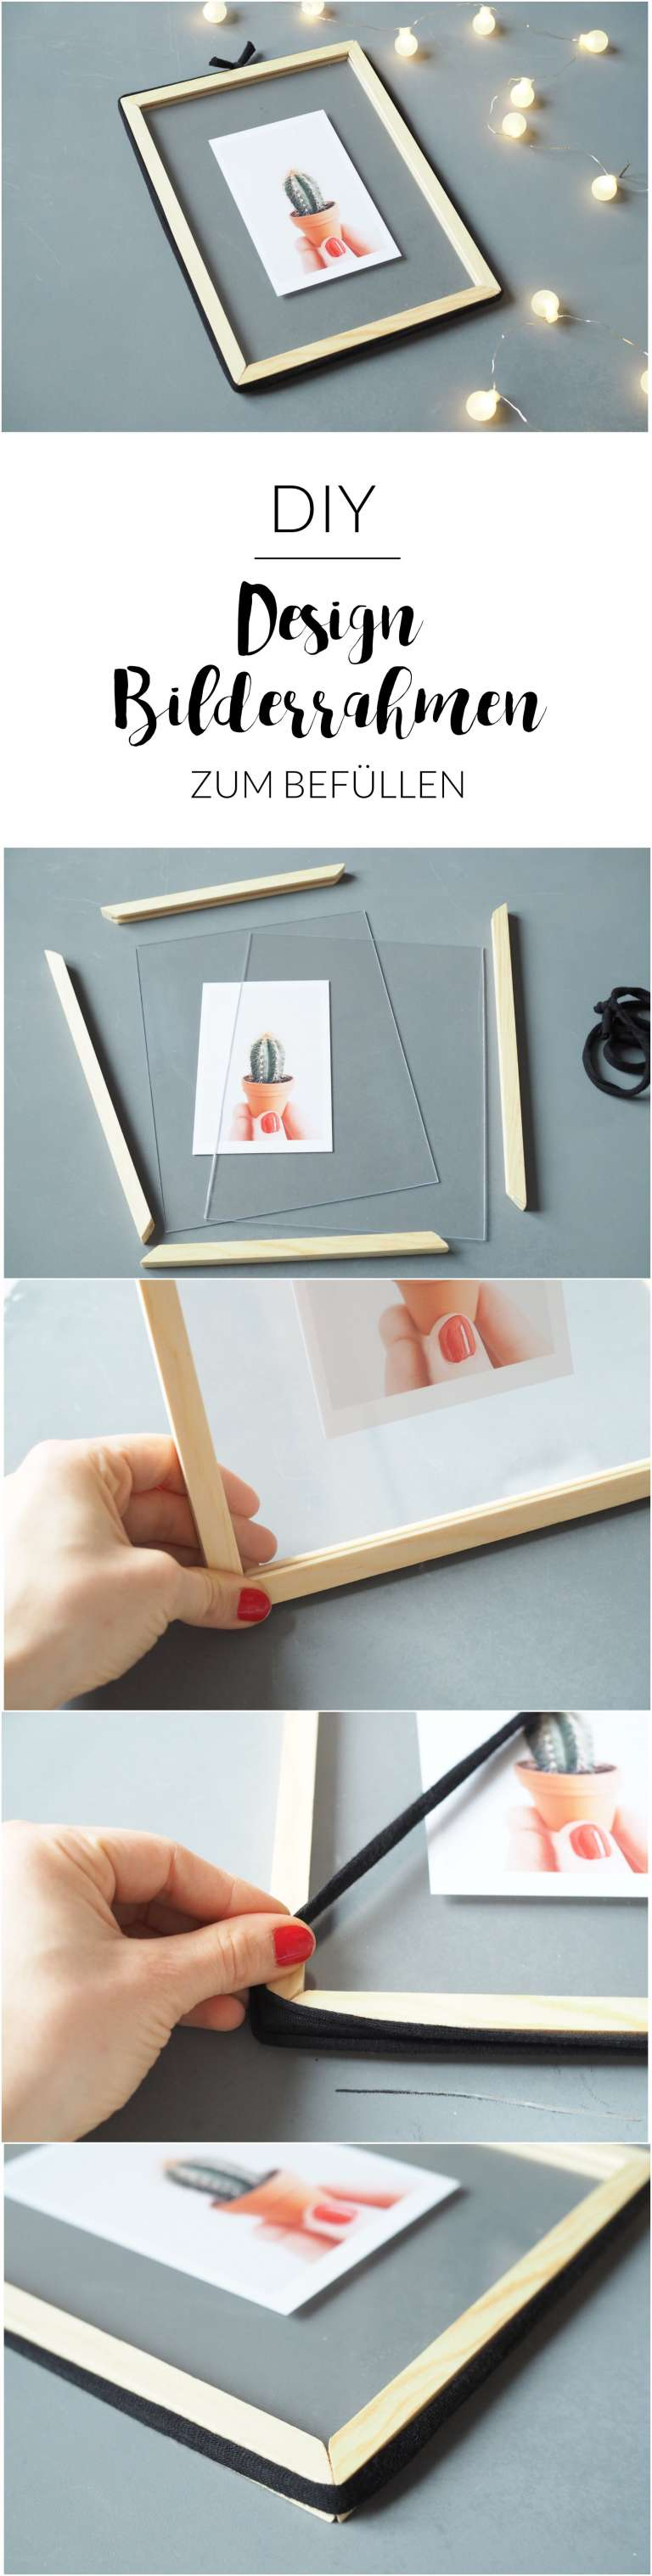 diy design bilderrahmen zum bef llen obsigen. Black Bedroom Furniture Sets. Home Design Ideas